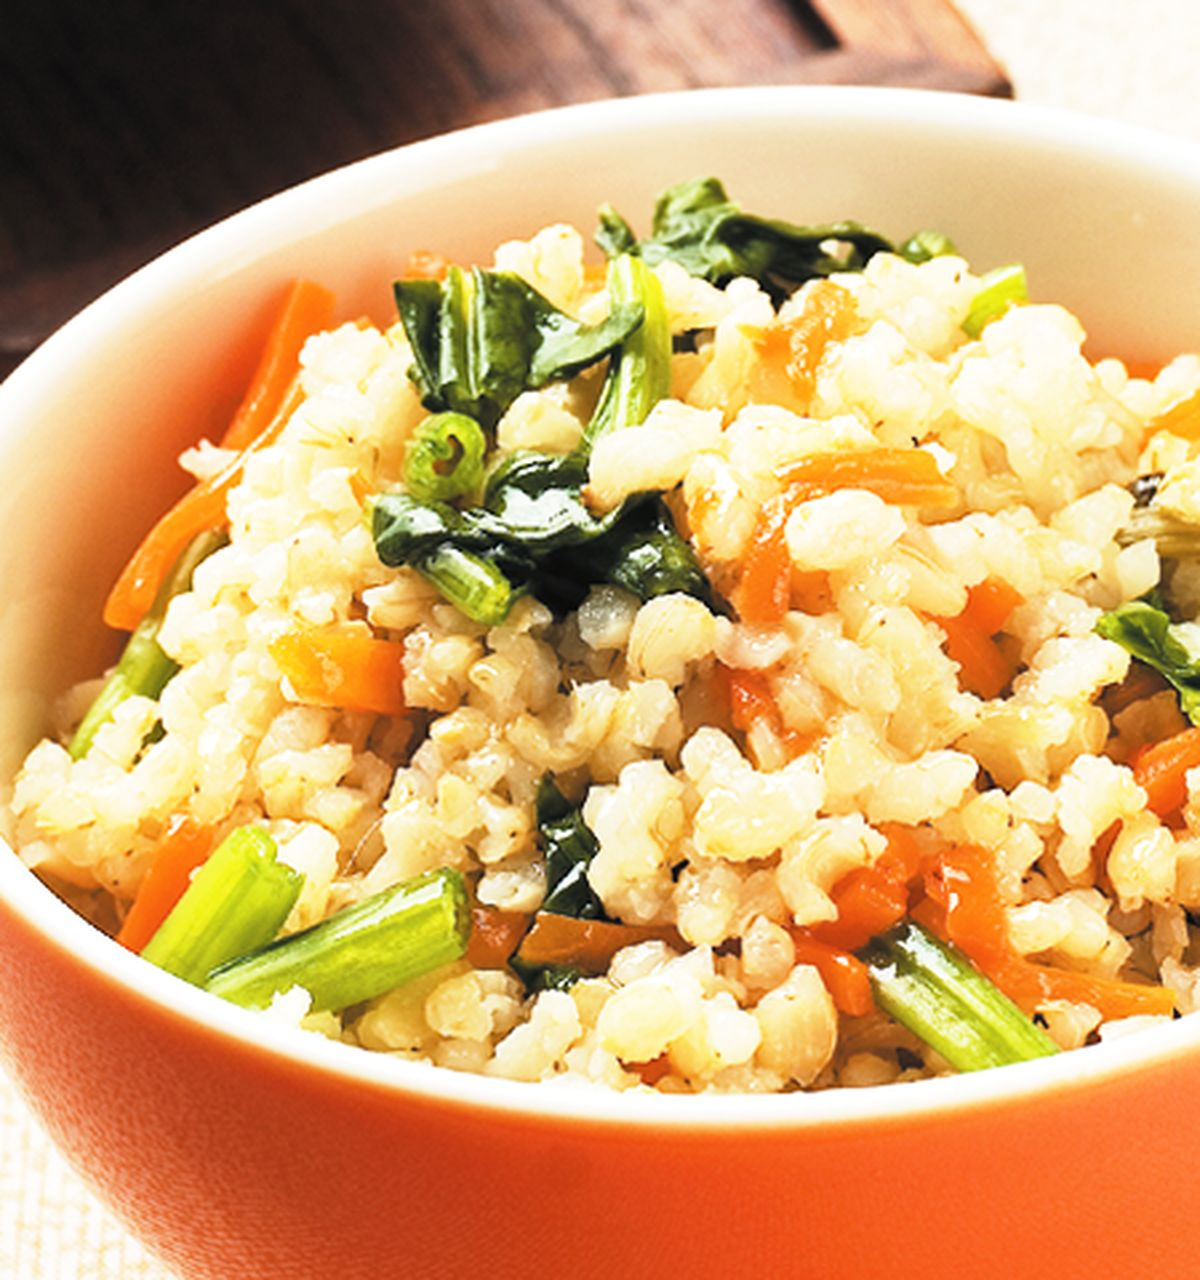 【食譜】菠菜發芽米飯:www.ytower.com.tw